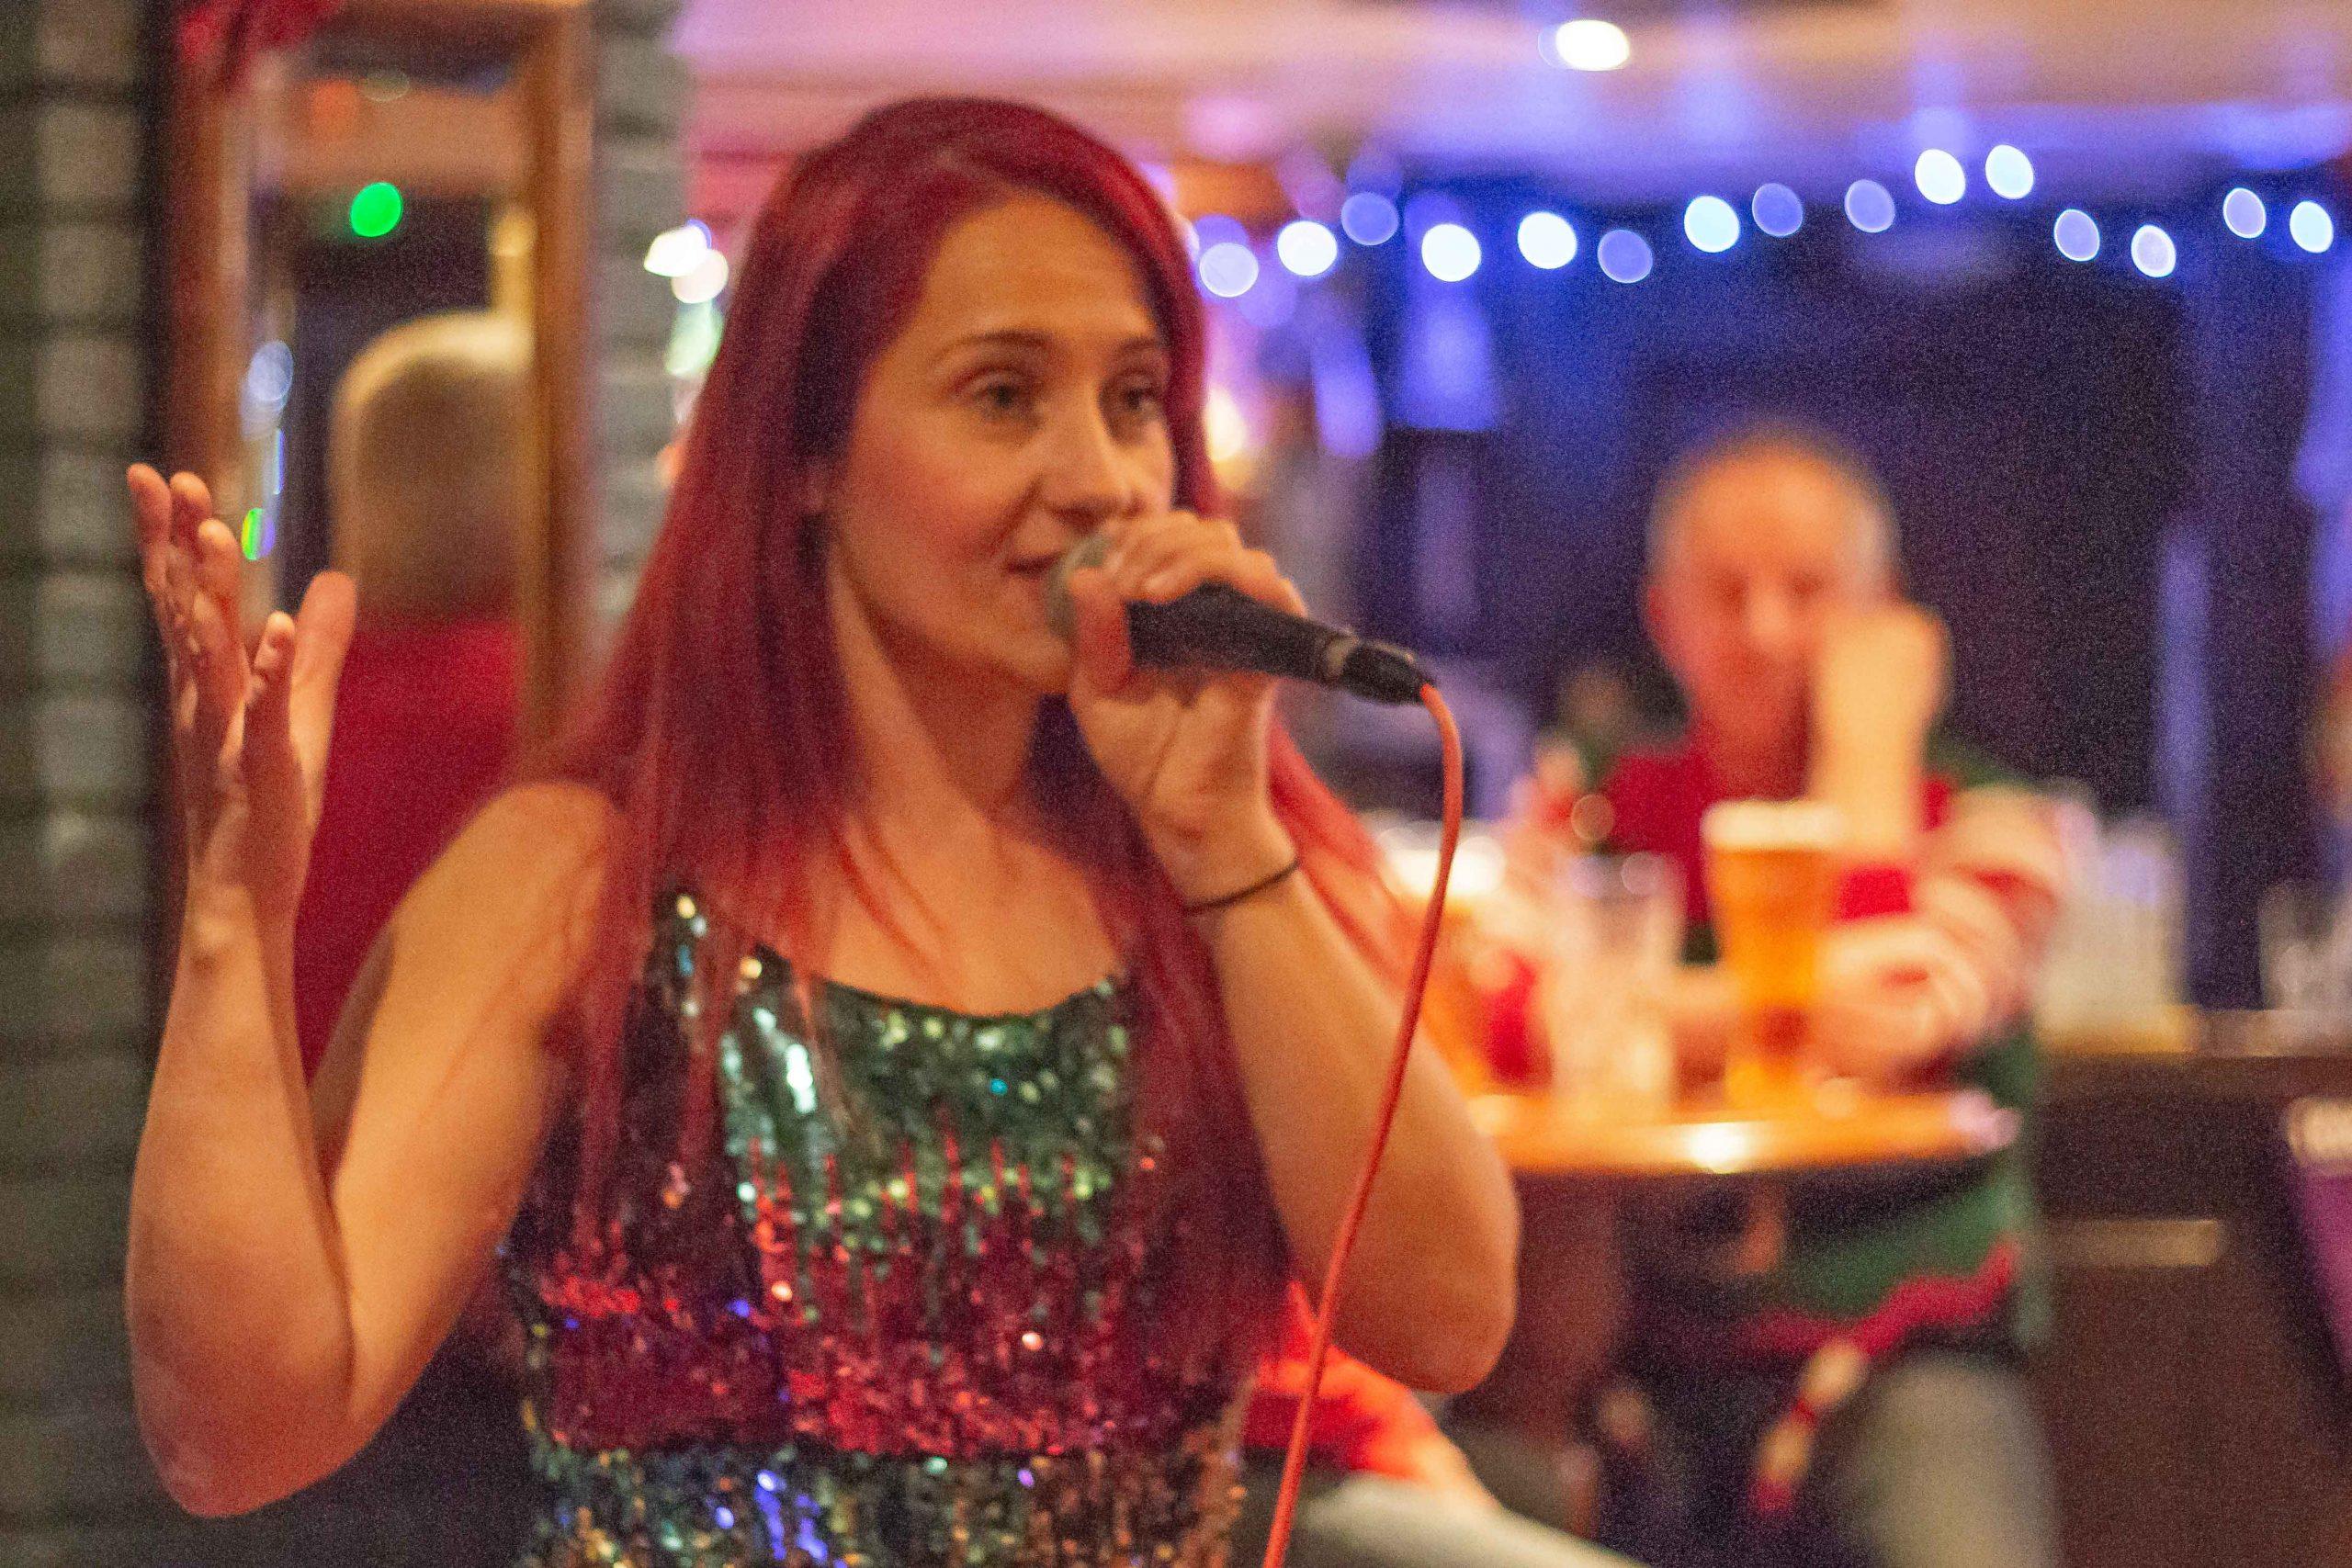 English Female Singer